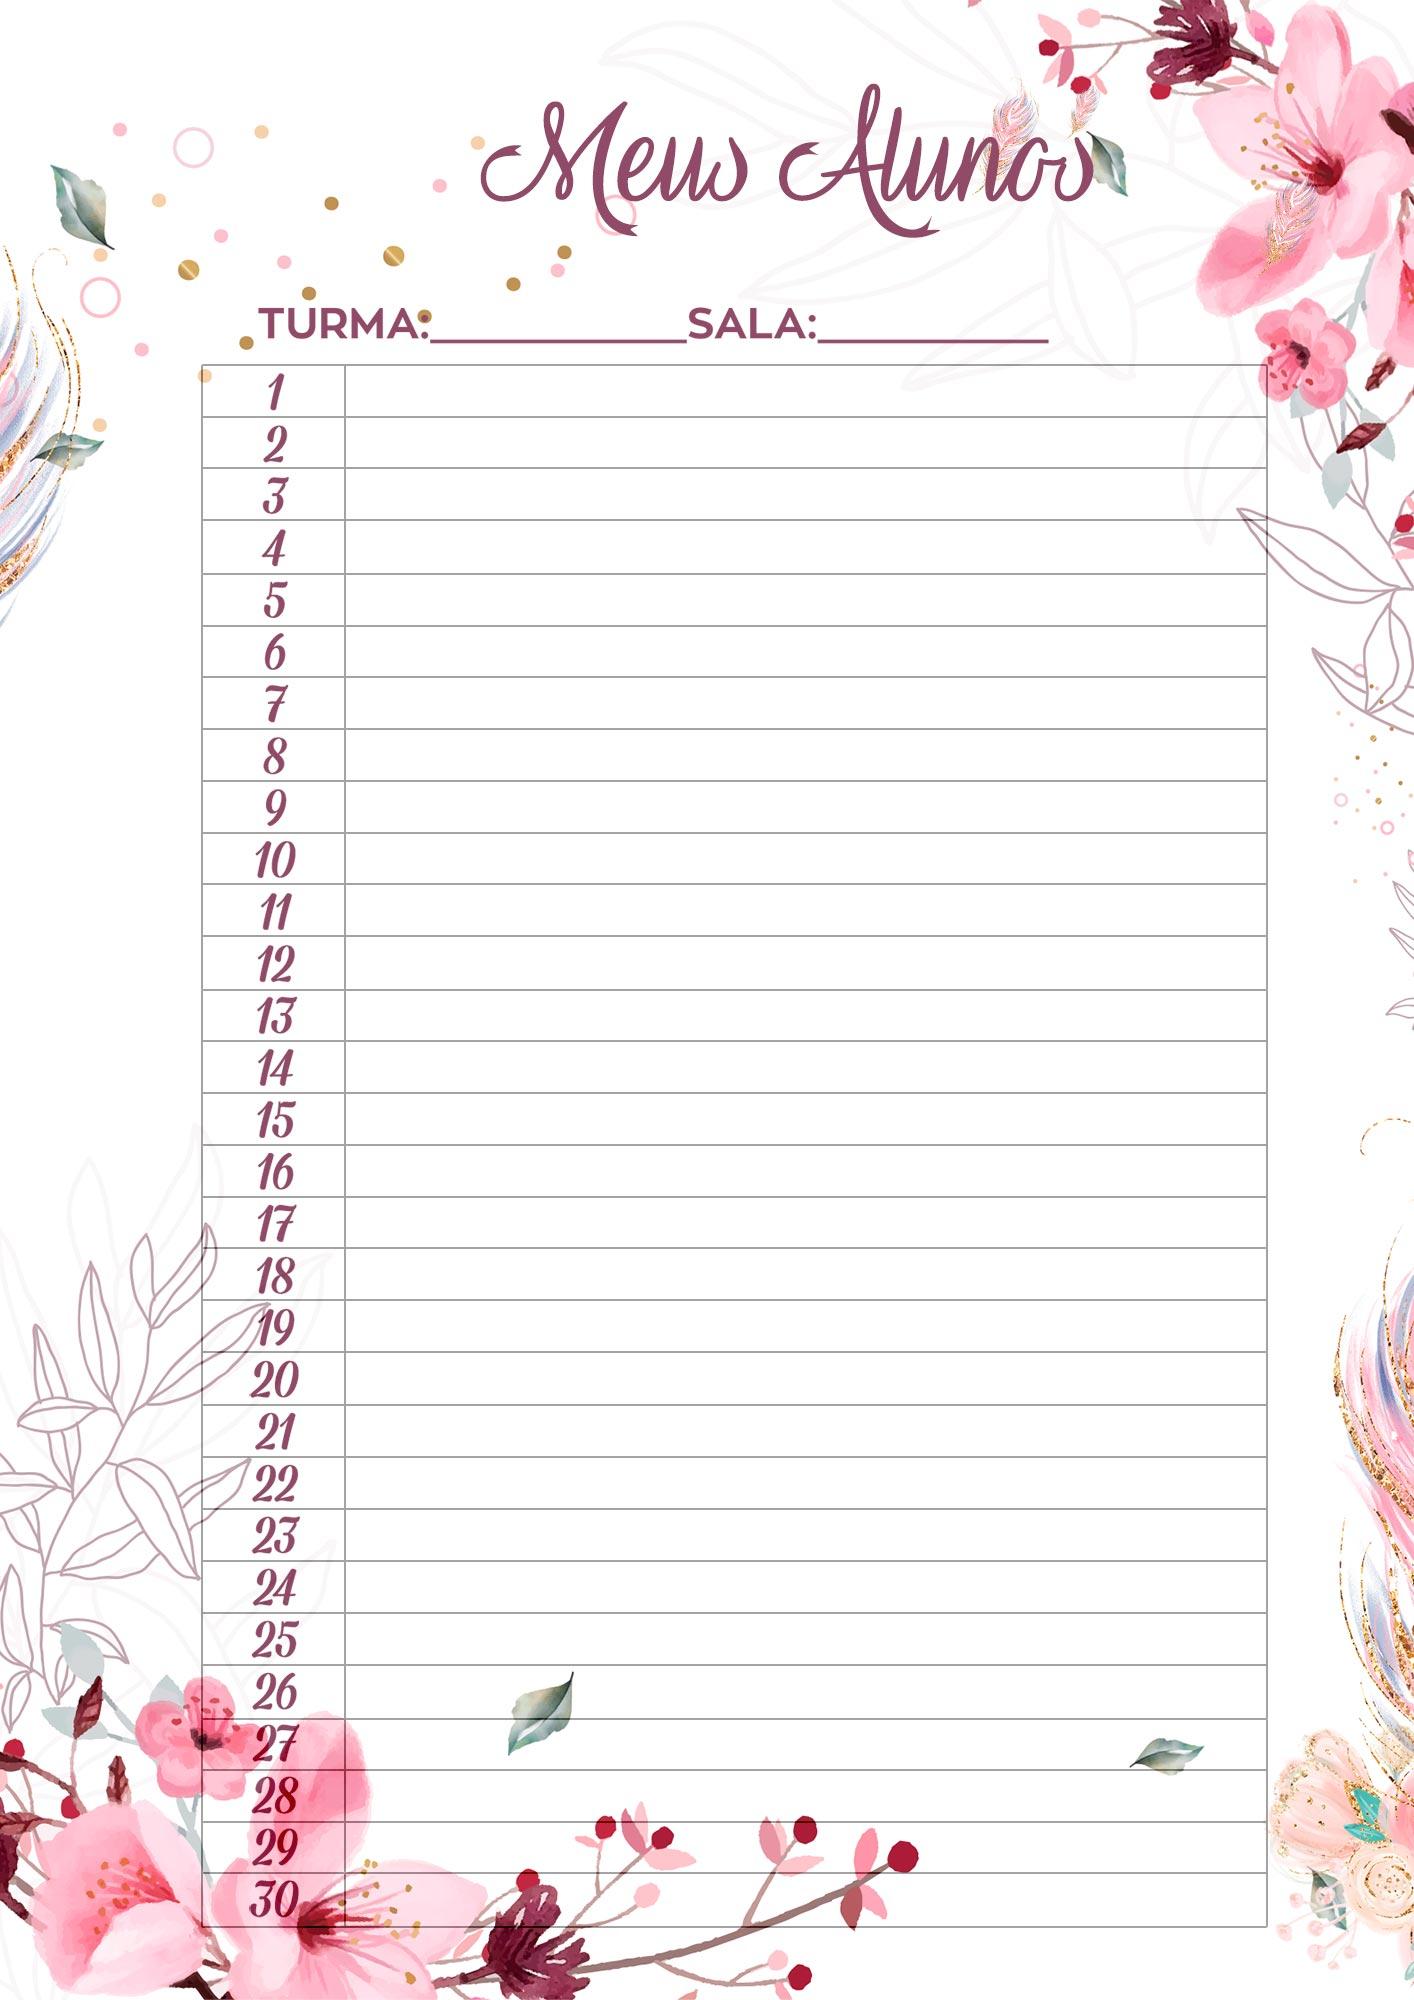 Planner para Professores Floral Meus Alunos